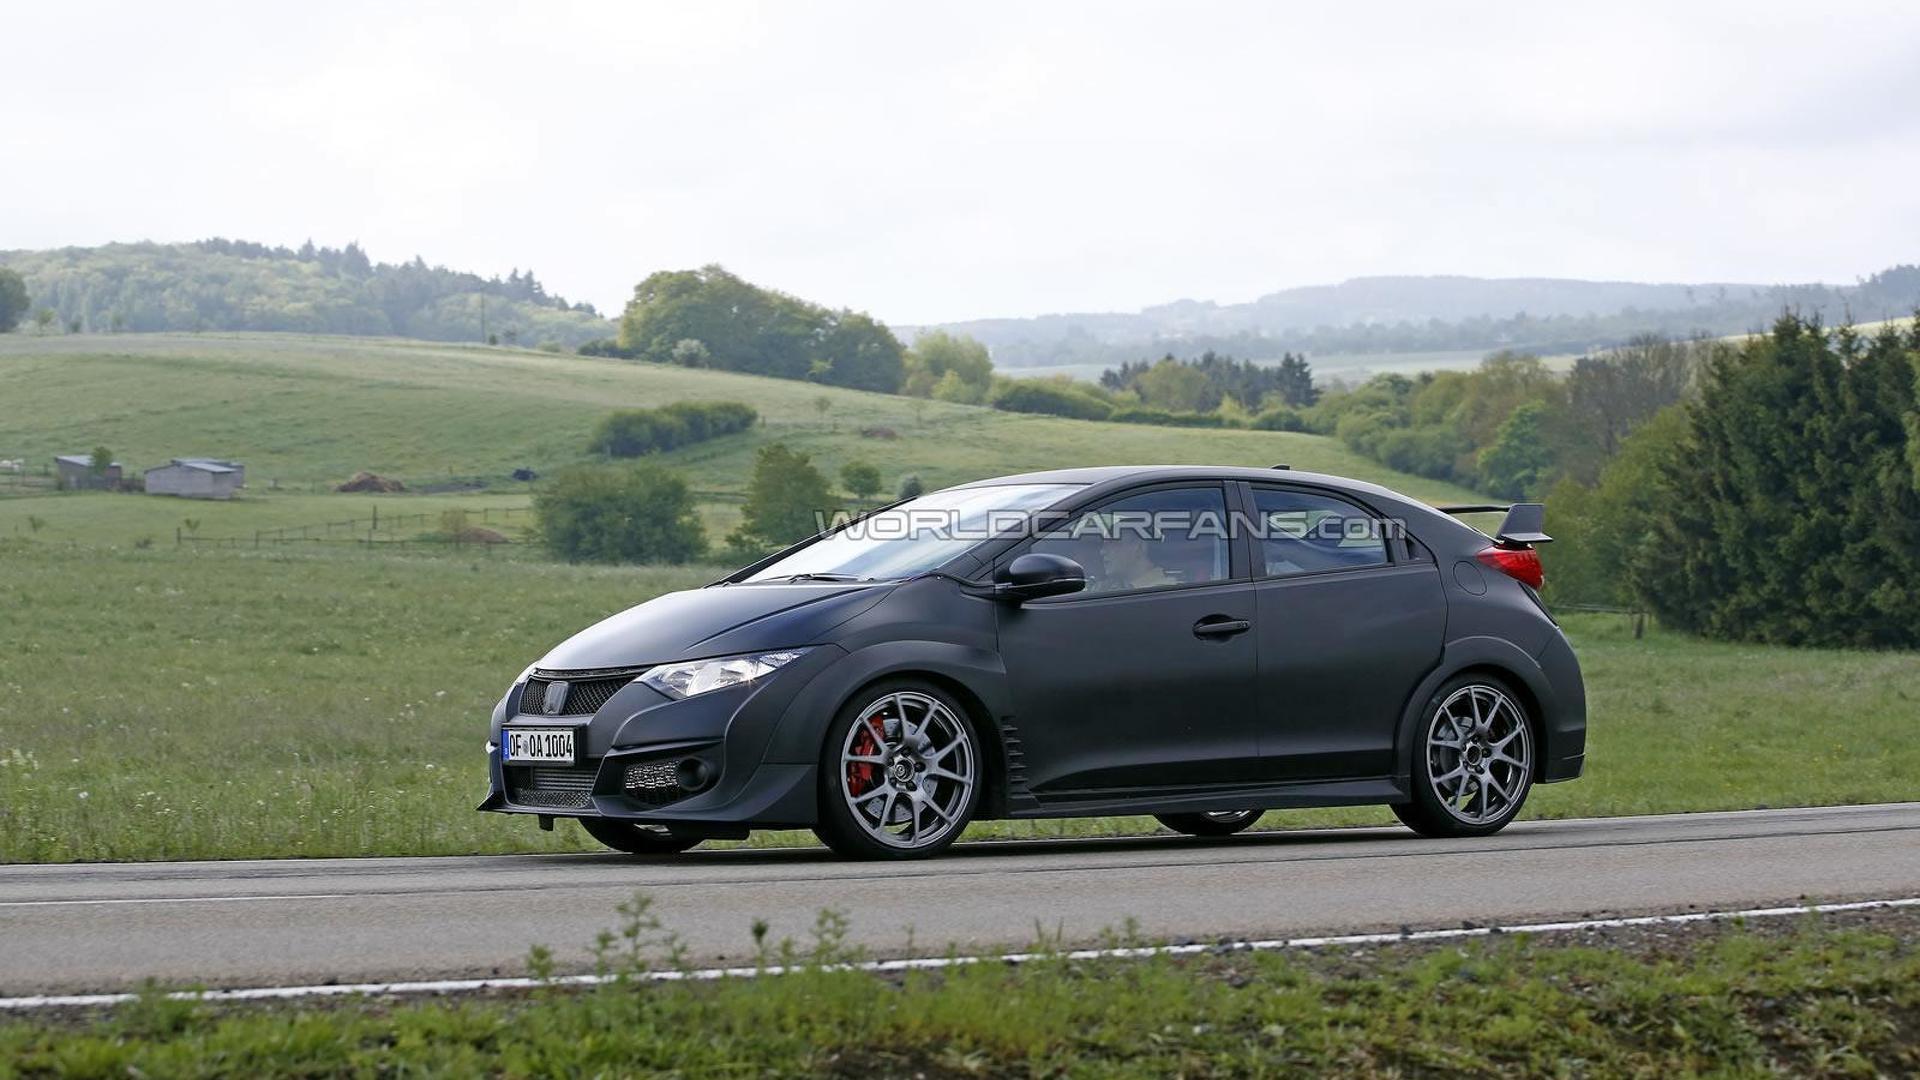 2015 Honda Civic Type R development prototype spied again